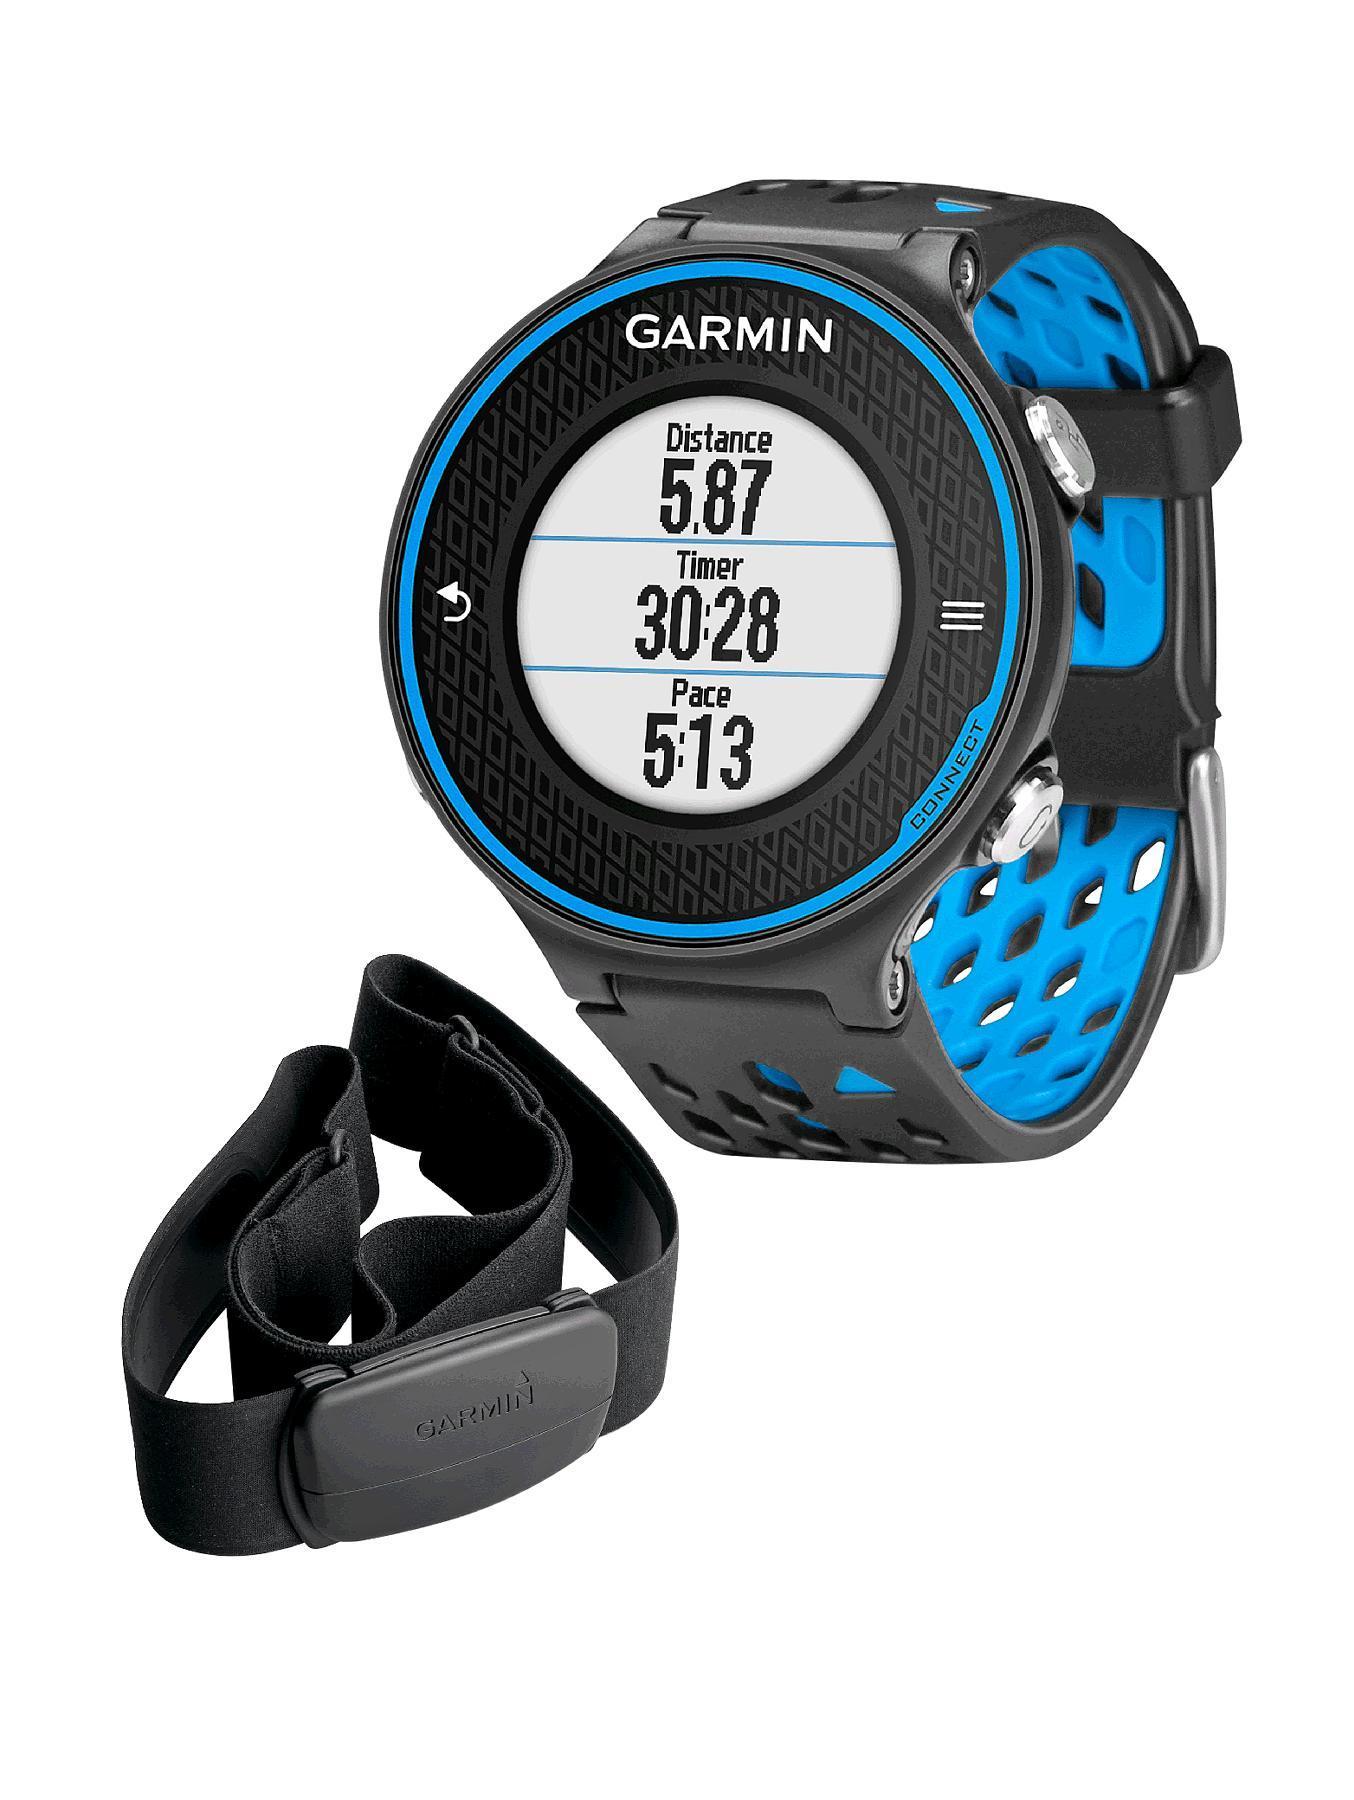 Garmin Forerunner 620 Advanced Running Watch with Heart Rate Monitor